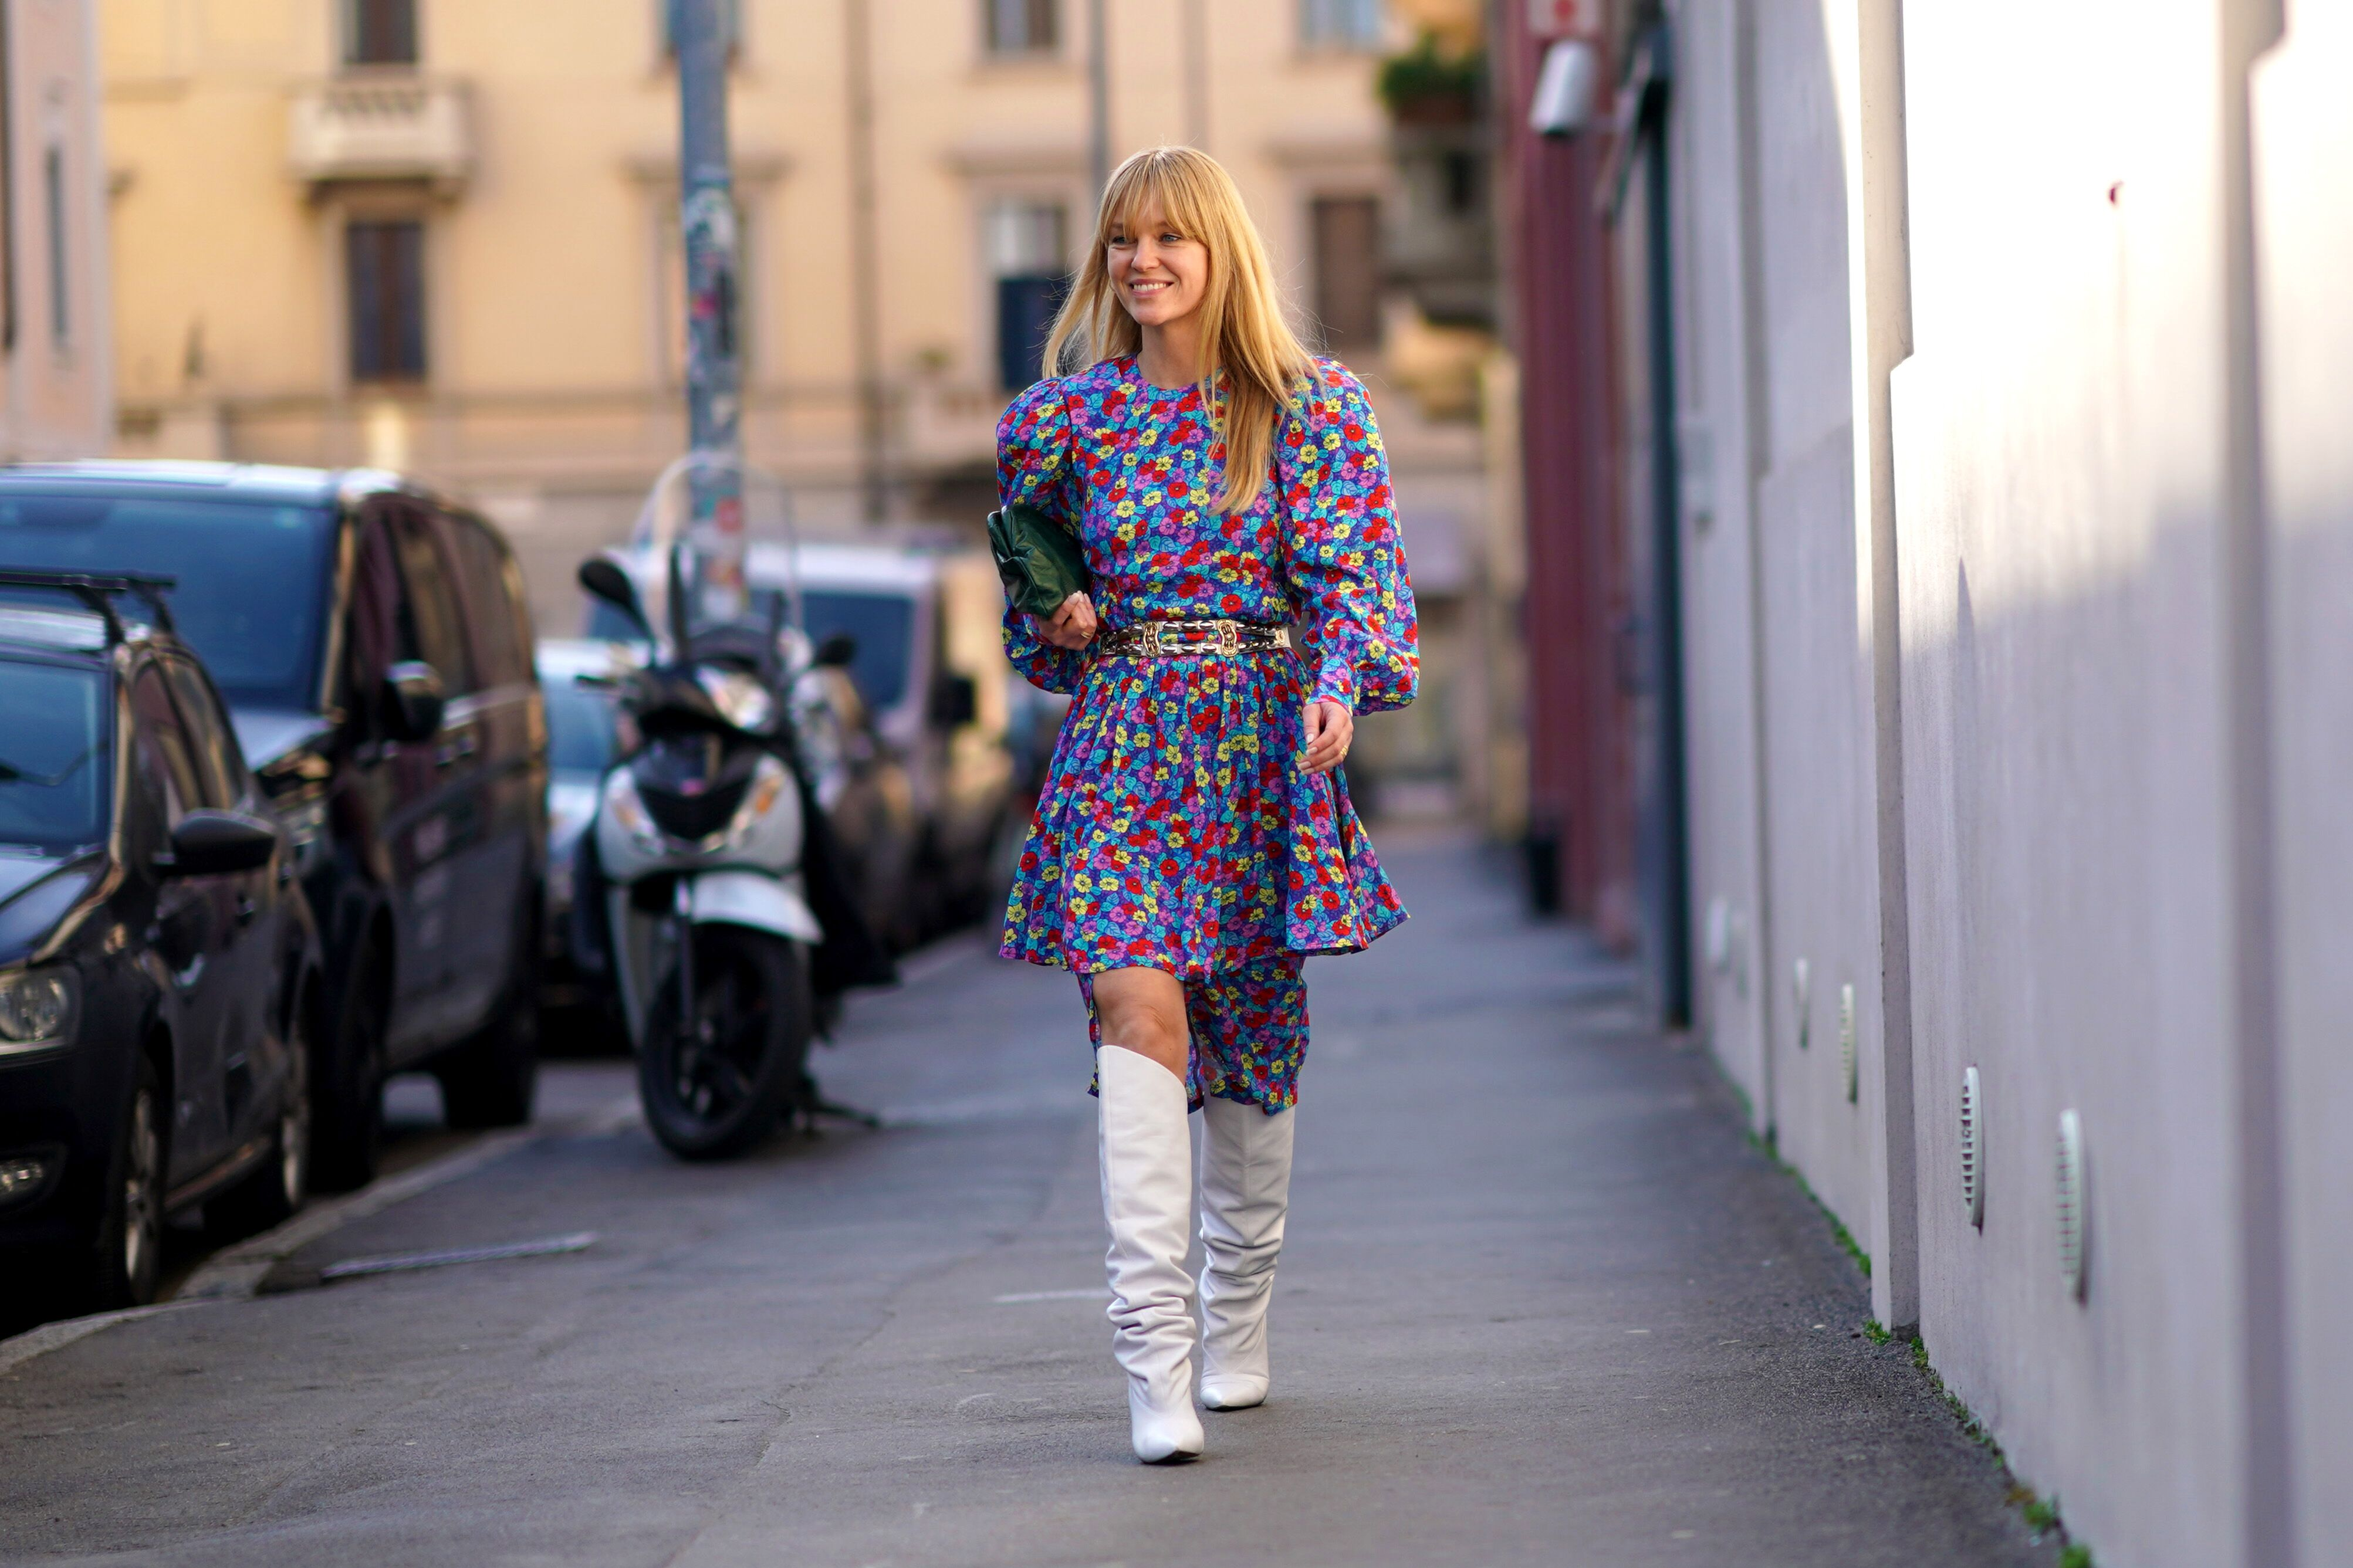 Automne Hiver Notre Shopping De Robes Tendance A Moins De 40 Euros Voici